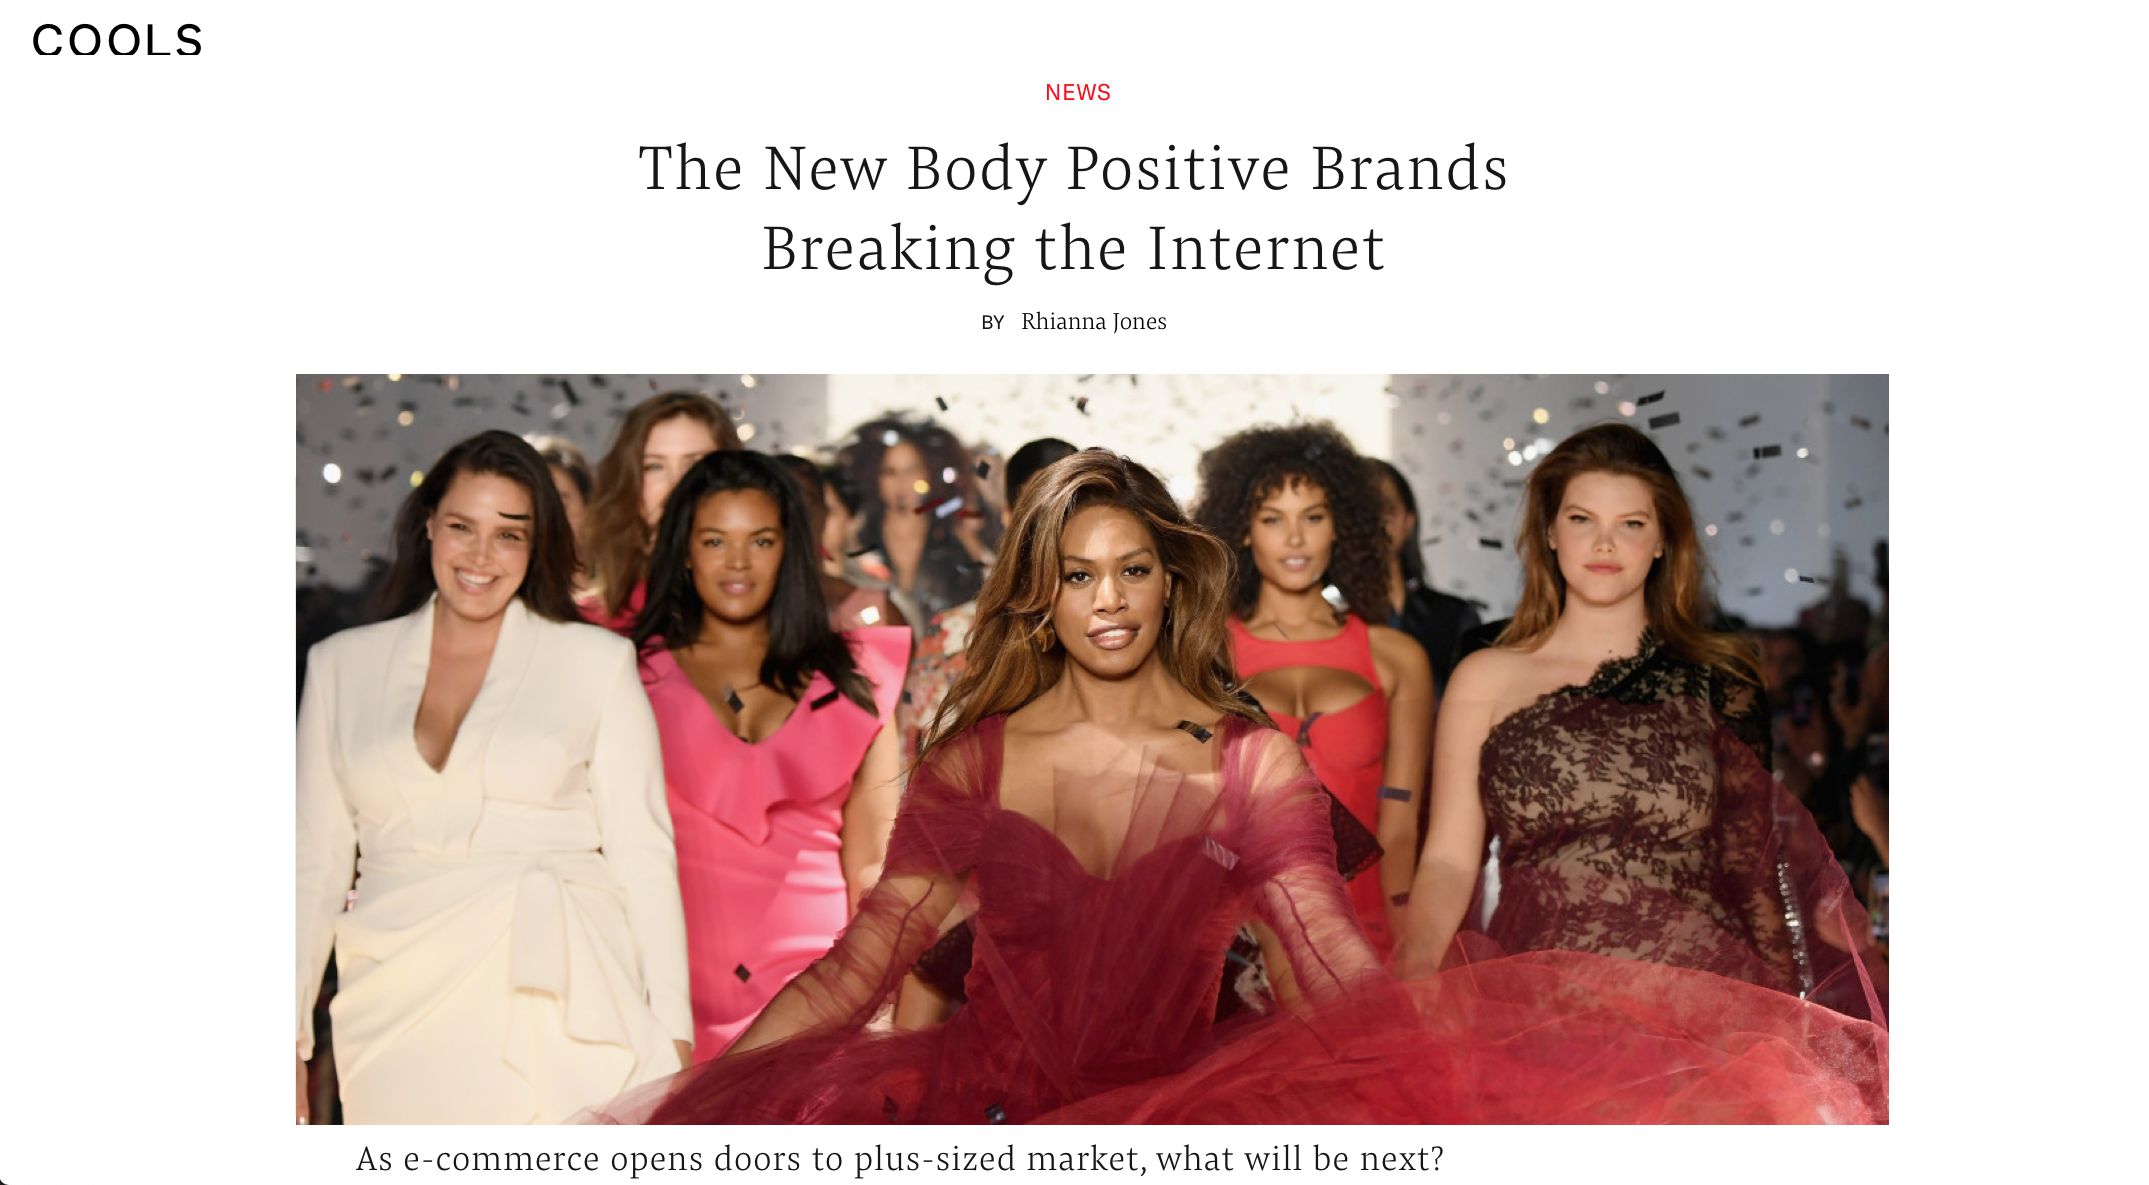 Body Positive Breaking the Internet